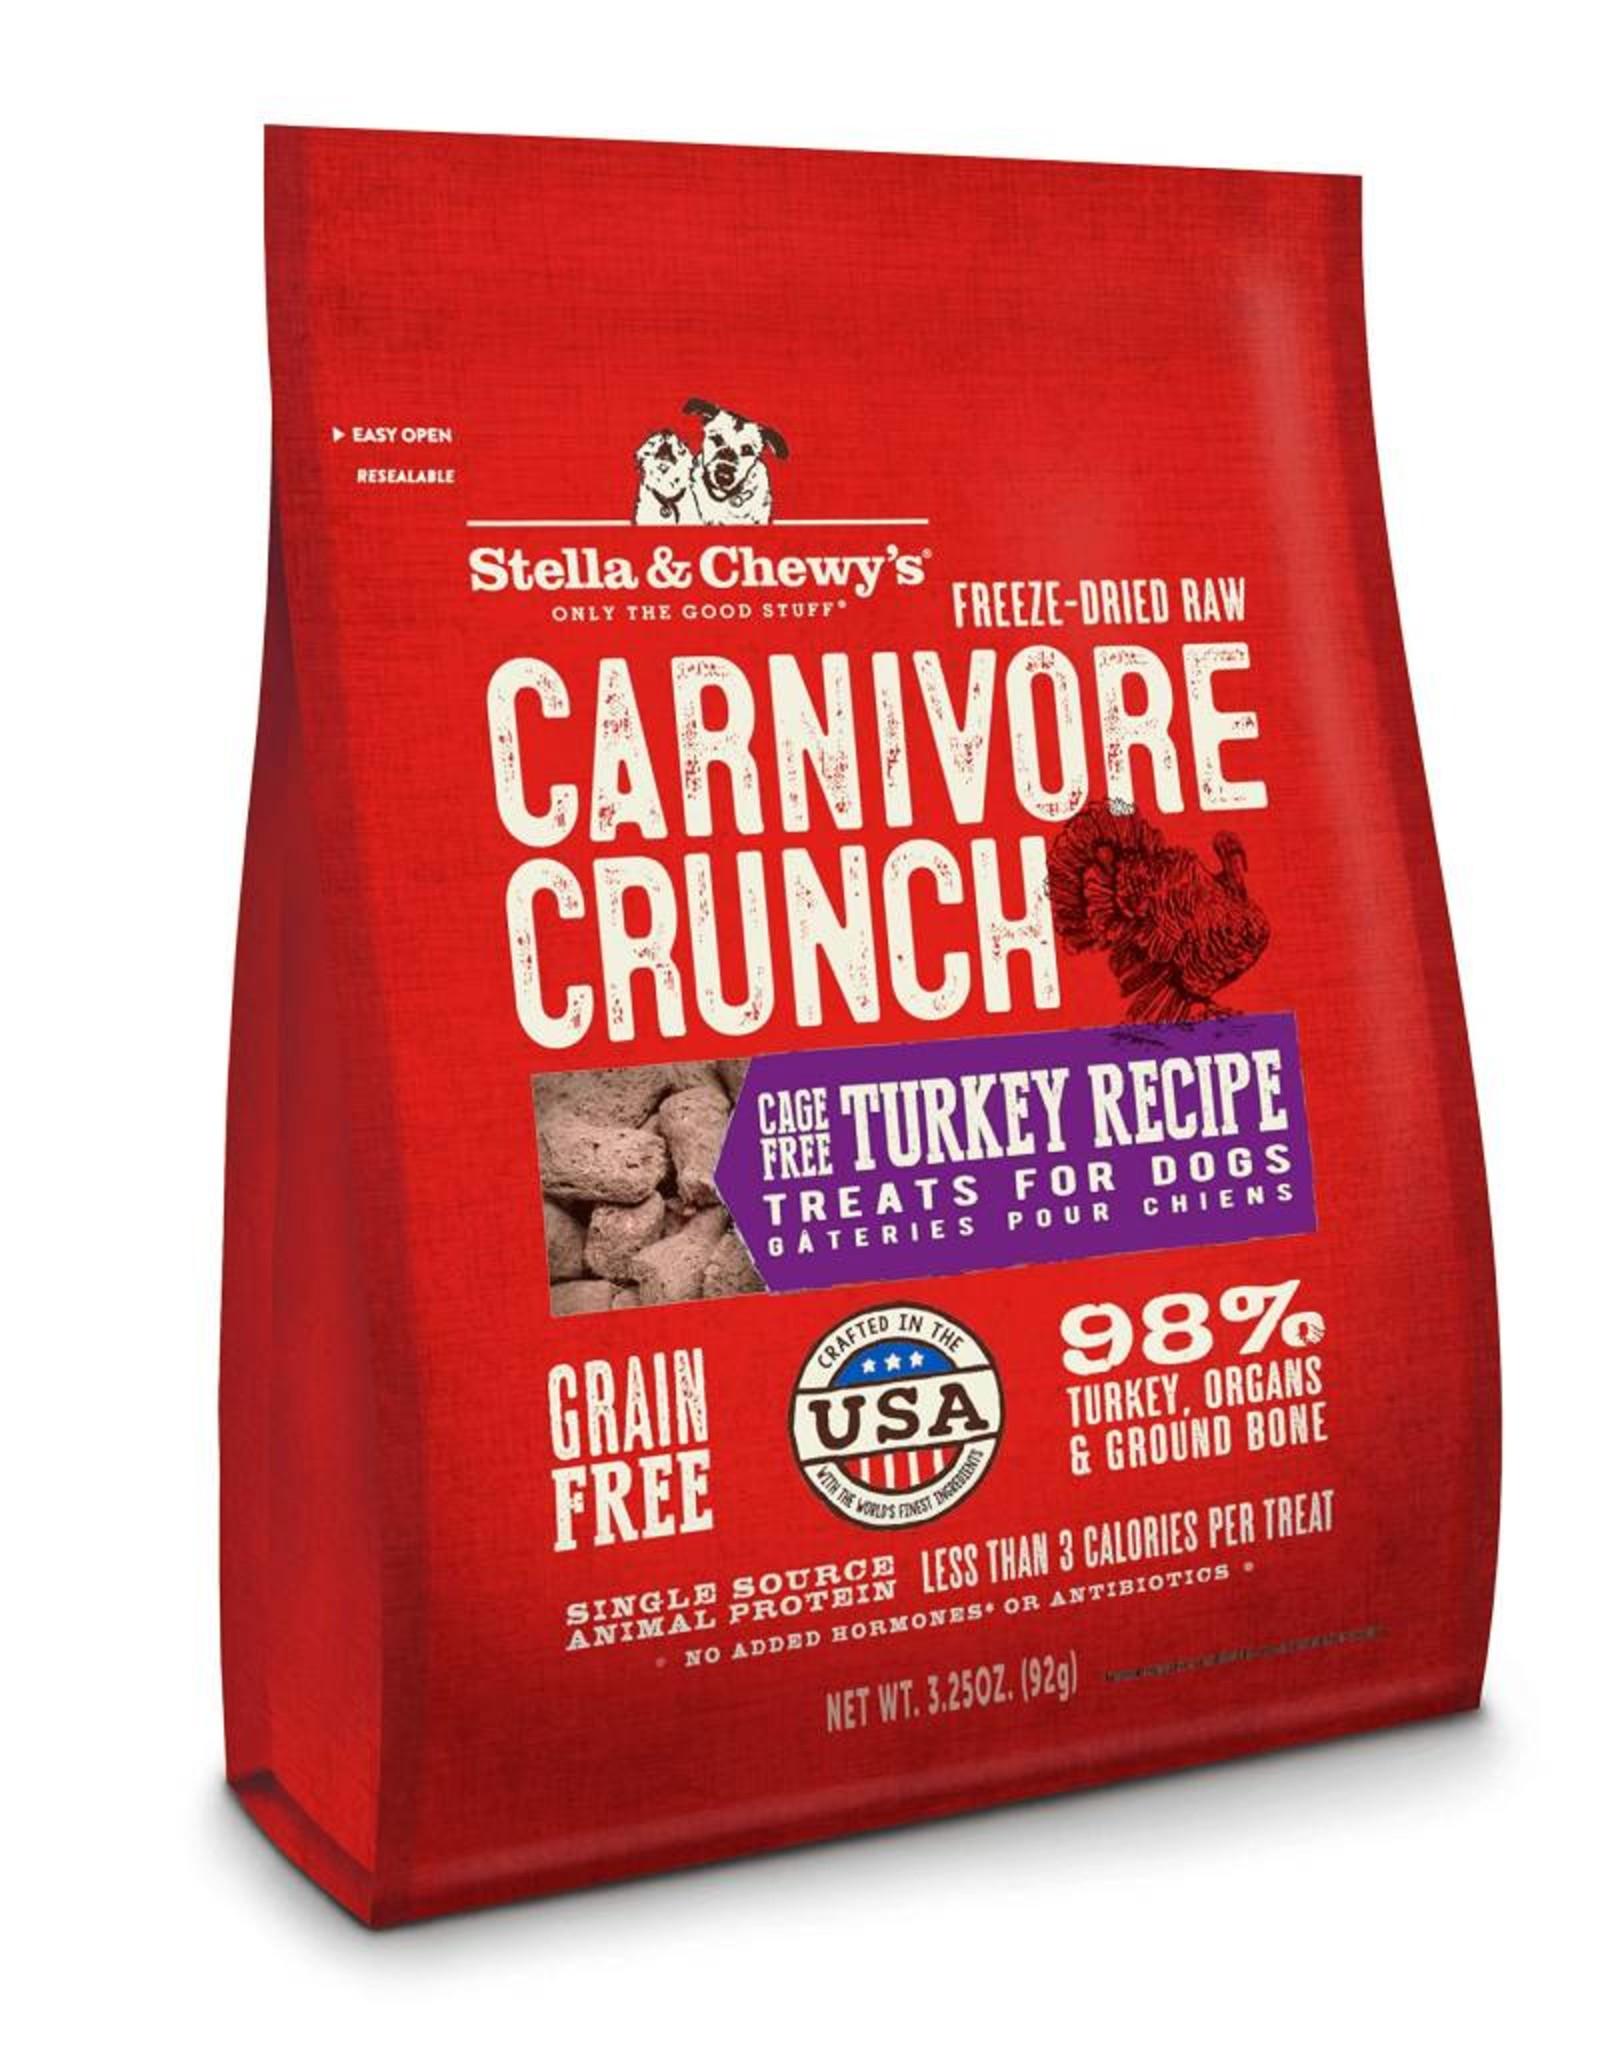 Stella & Chewy's Stella & Chewy's Carnivore Crunch Cage-Free Turkey Recipe Dog Treats- 3.25 oz.  bag